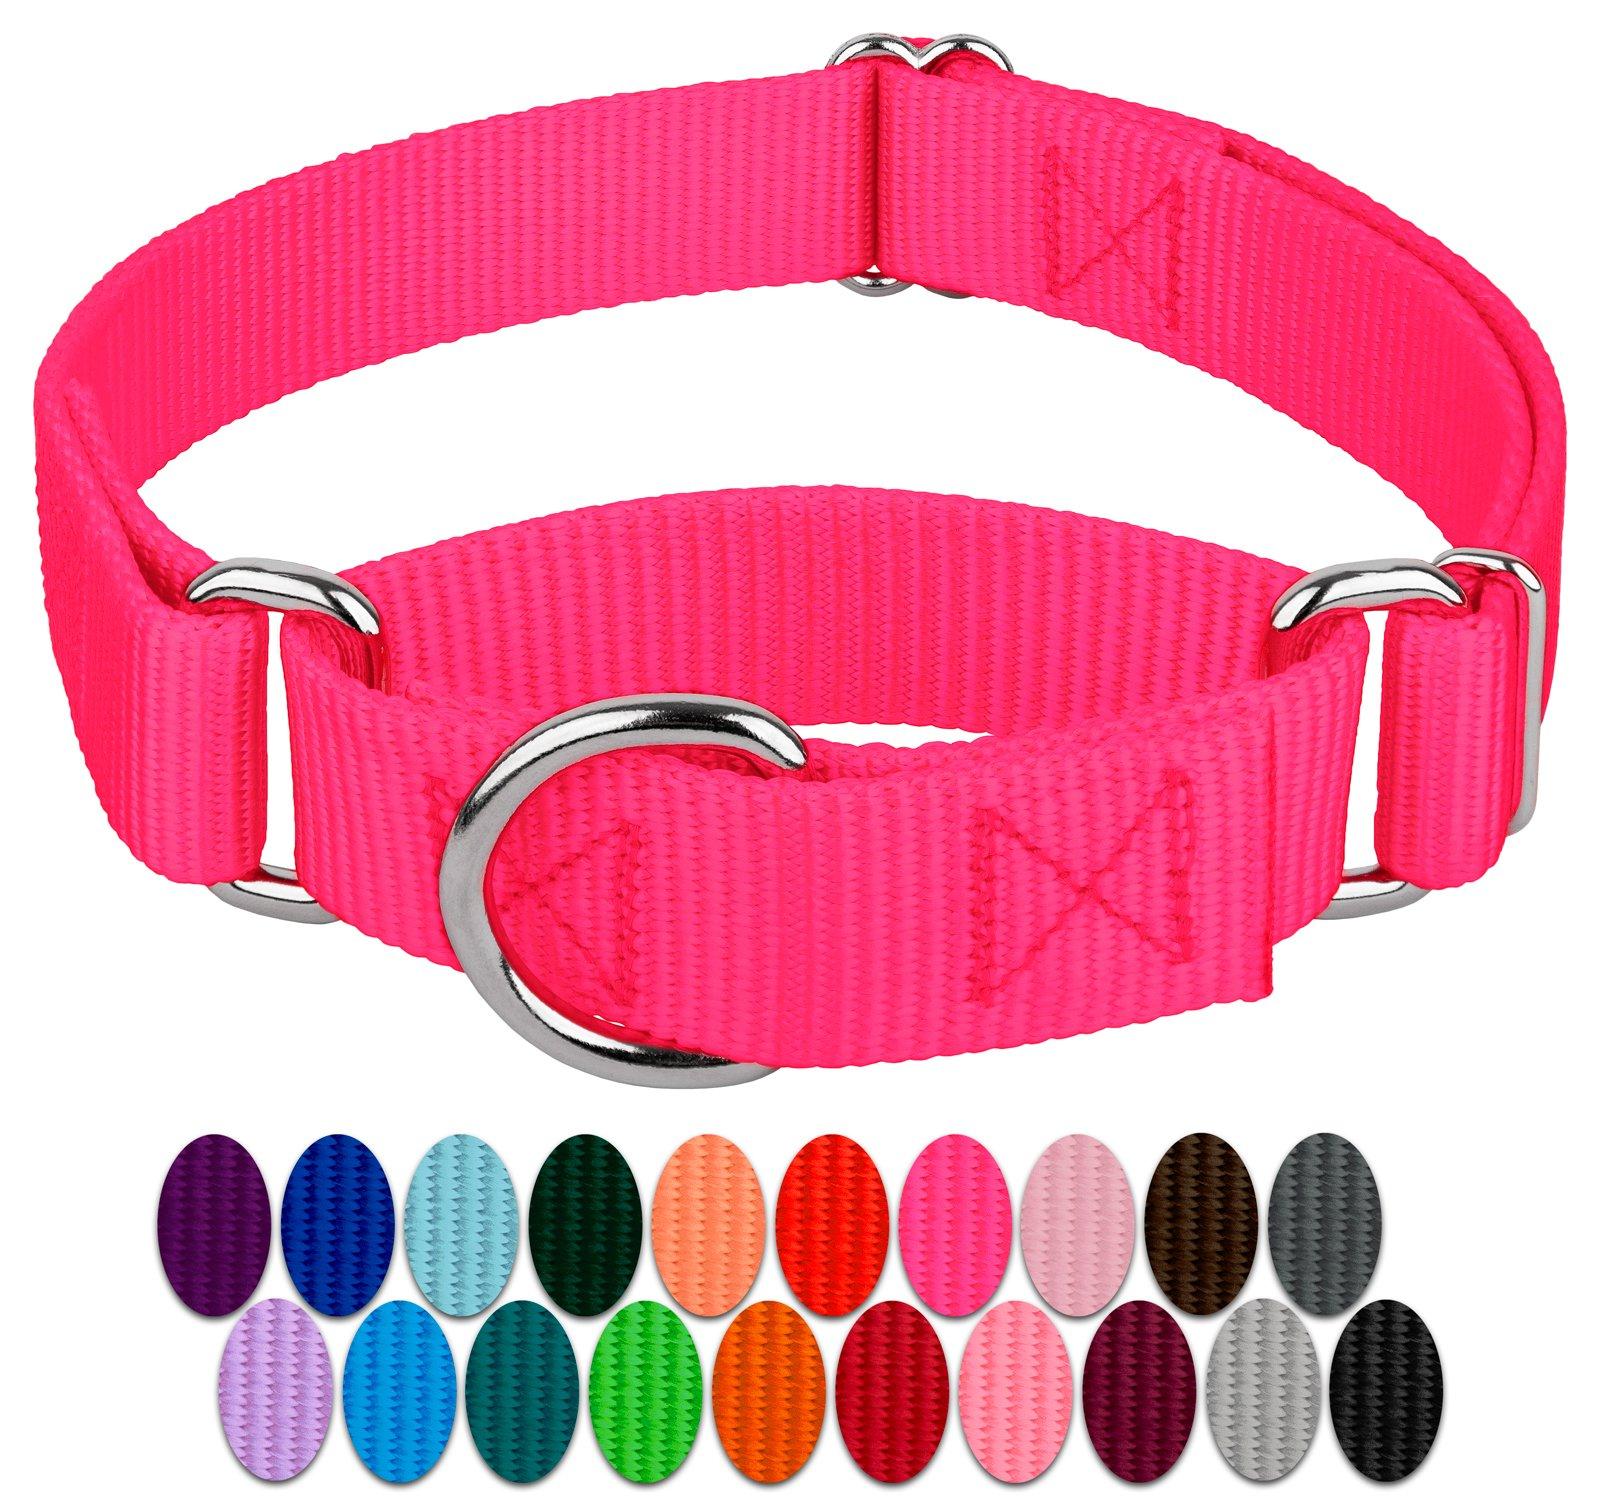 Country Brook Design 10 Nylon Martingale Heavyduty Dog Collars - Hot Pink - Medium